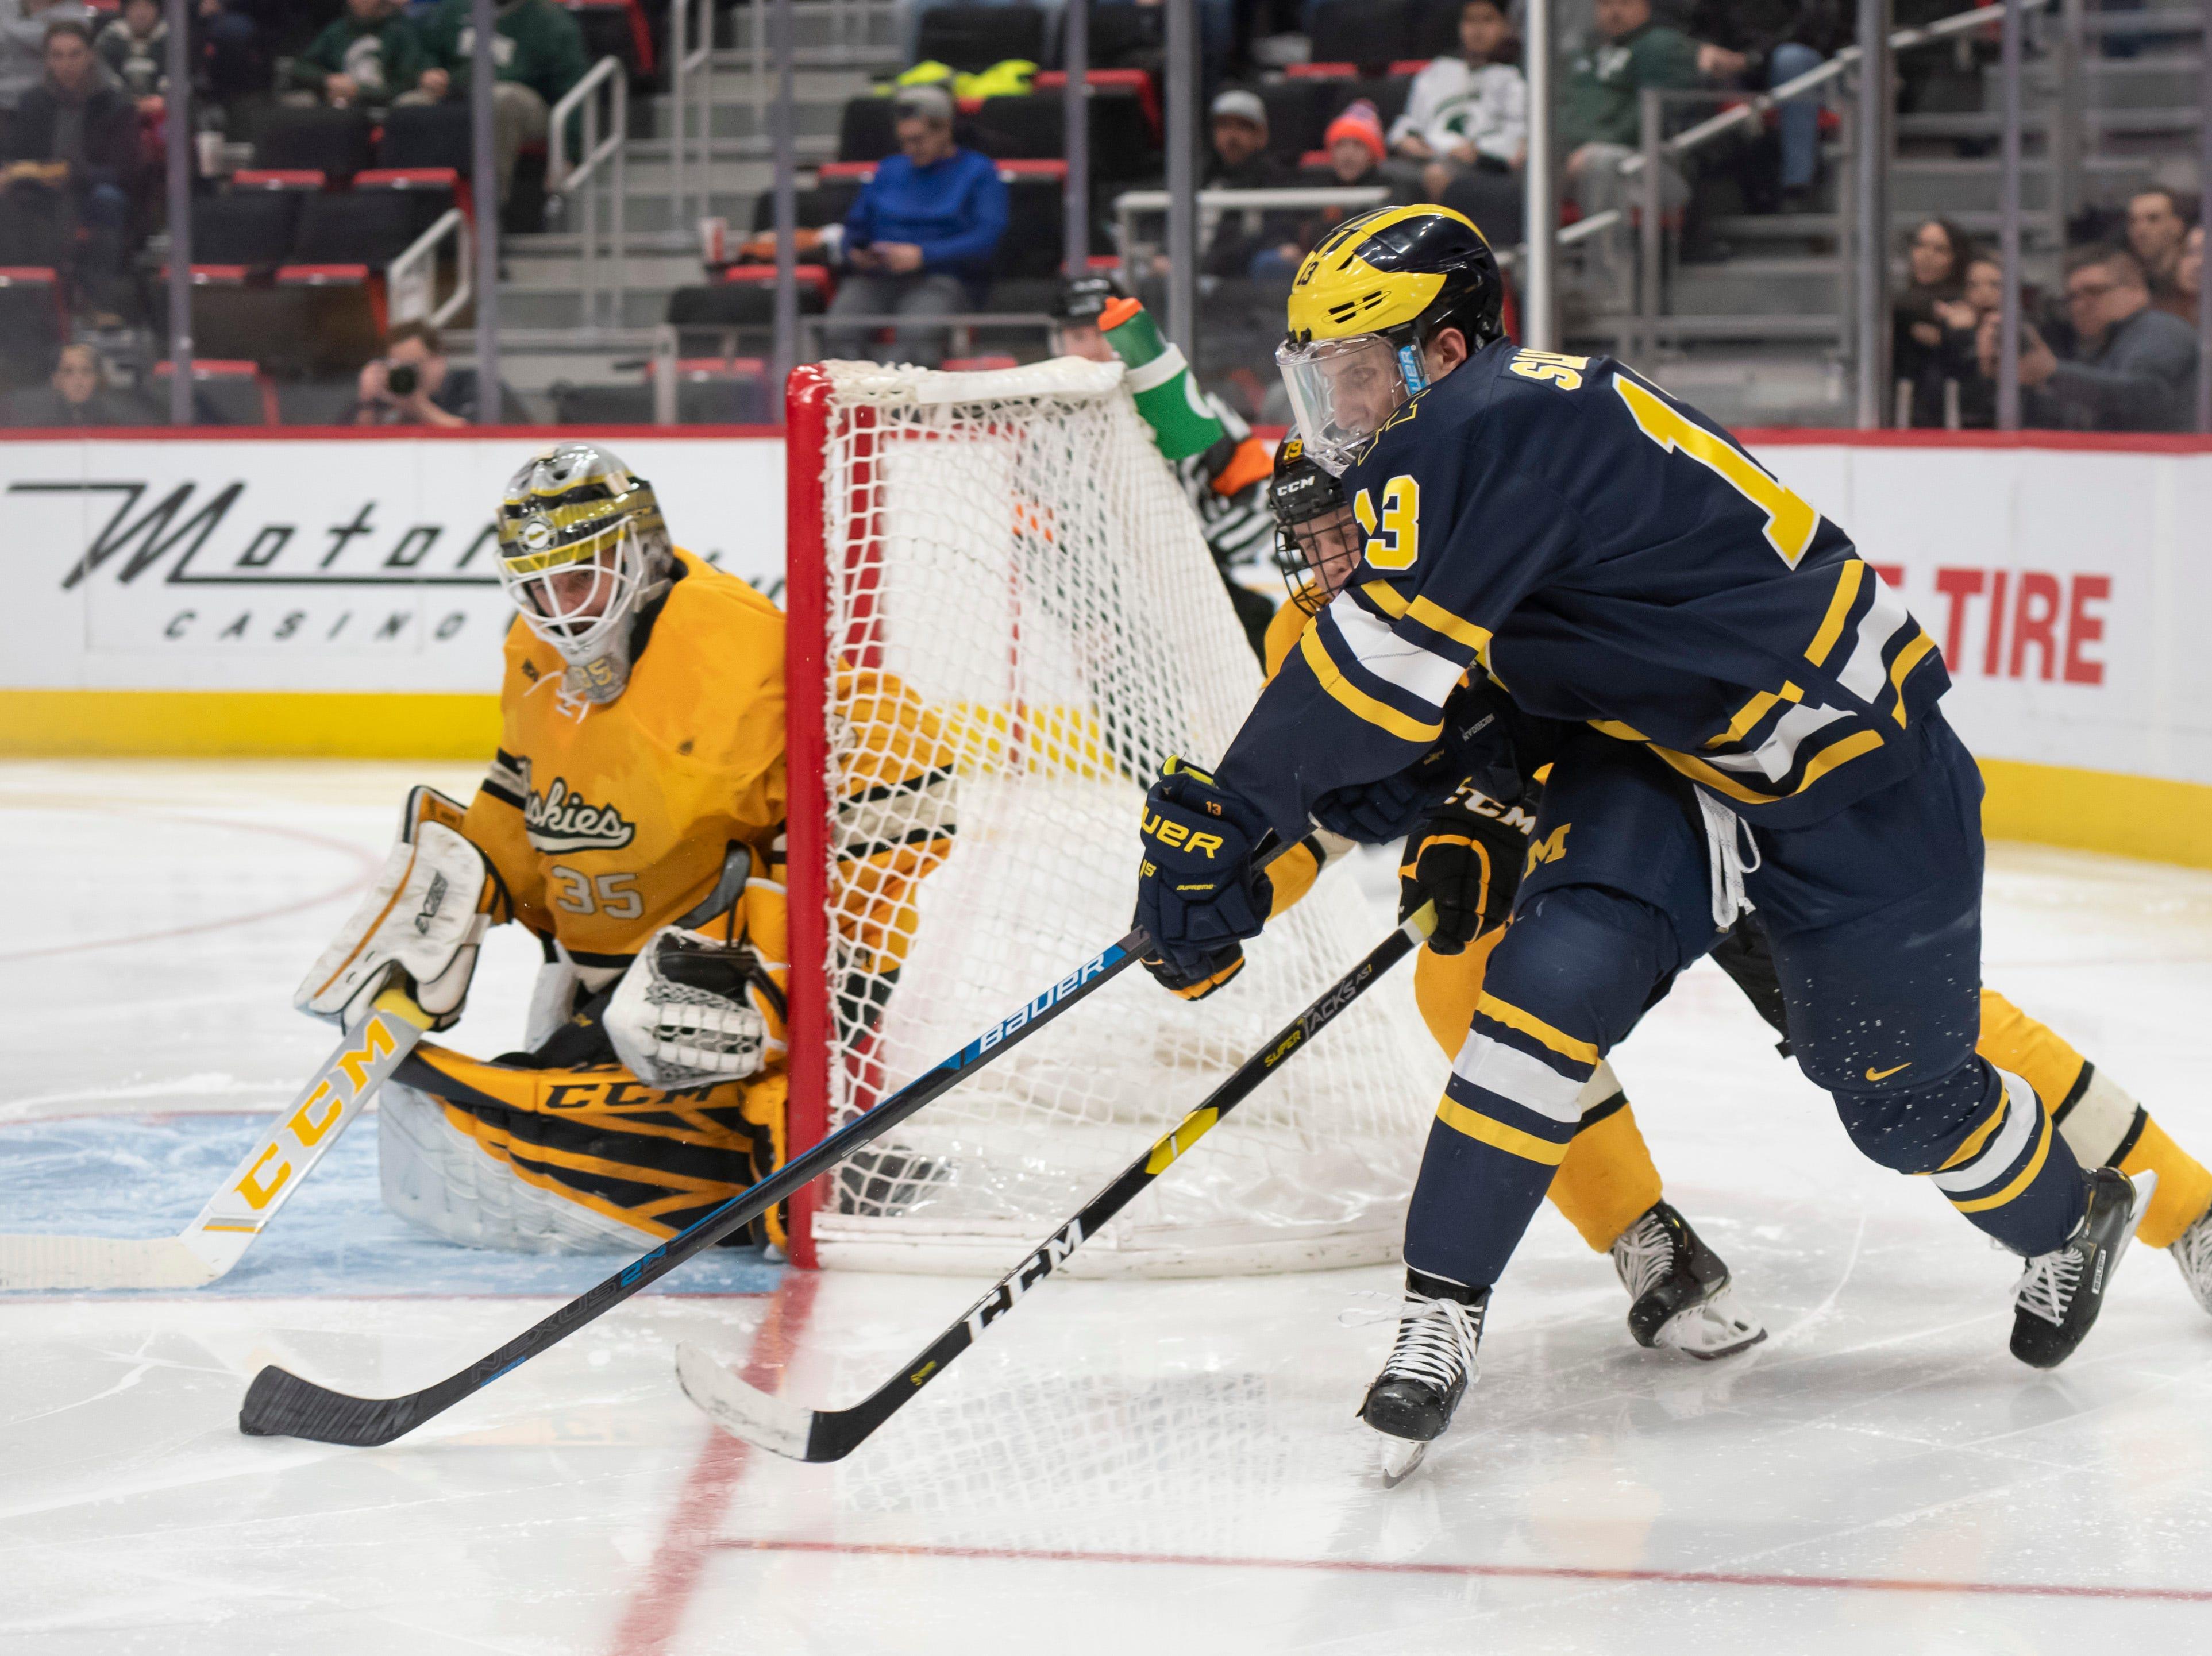 Michigan forward Jake Slaker tries to wrap the puck around Michigan Tech goaltender Robbie Beydoun in the second period.